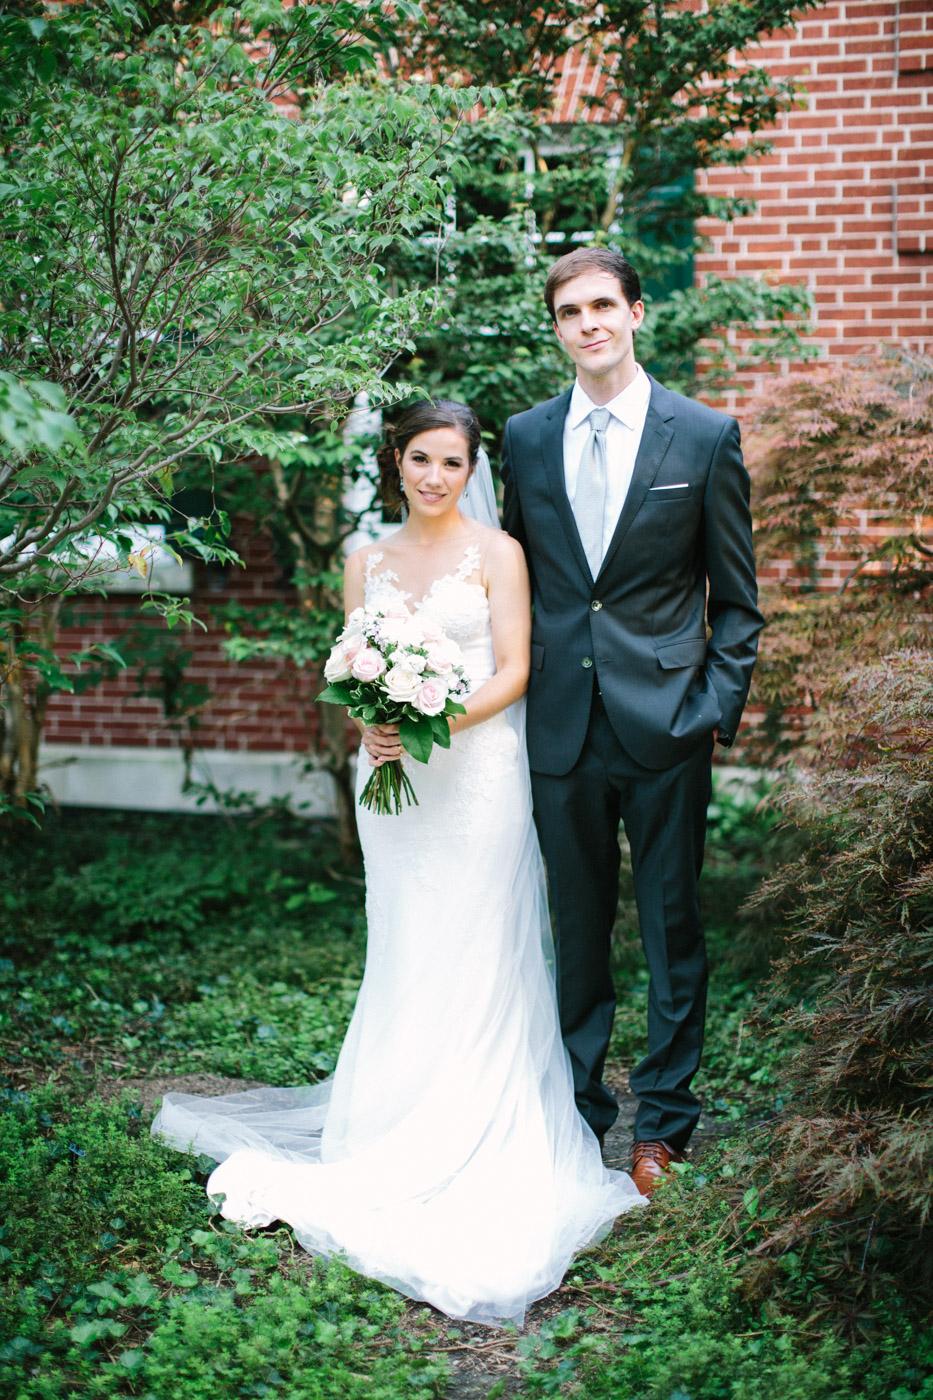 Kelly & Ben Wedding Web 2016-302.jpg